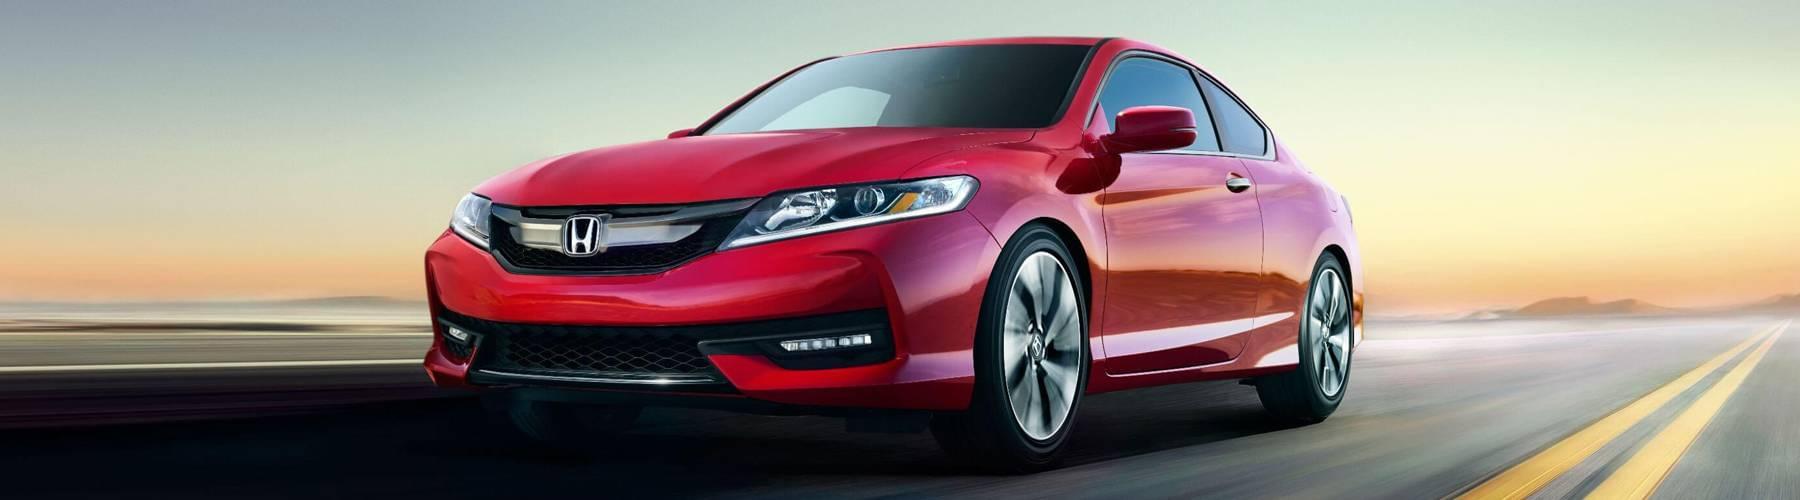 2017 honda accord coupe mid michigan honda dealers for Honda dealer michigan